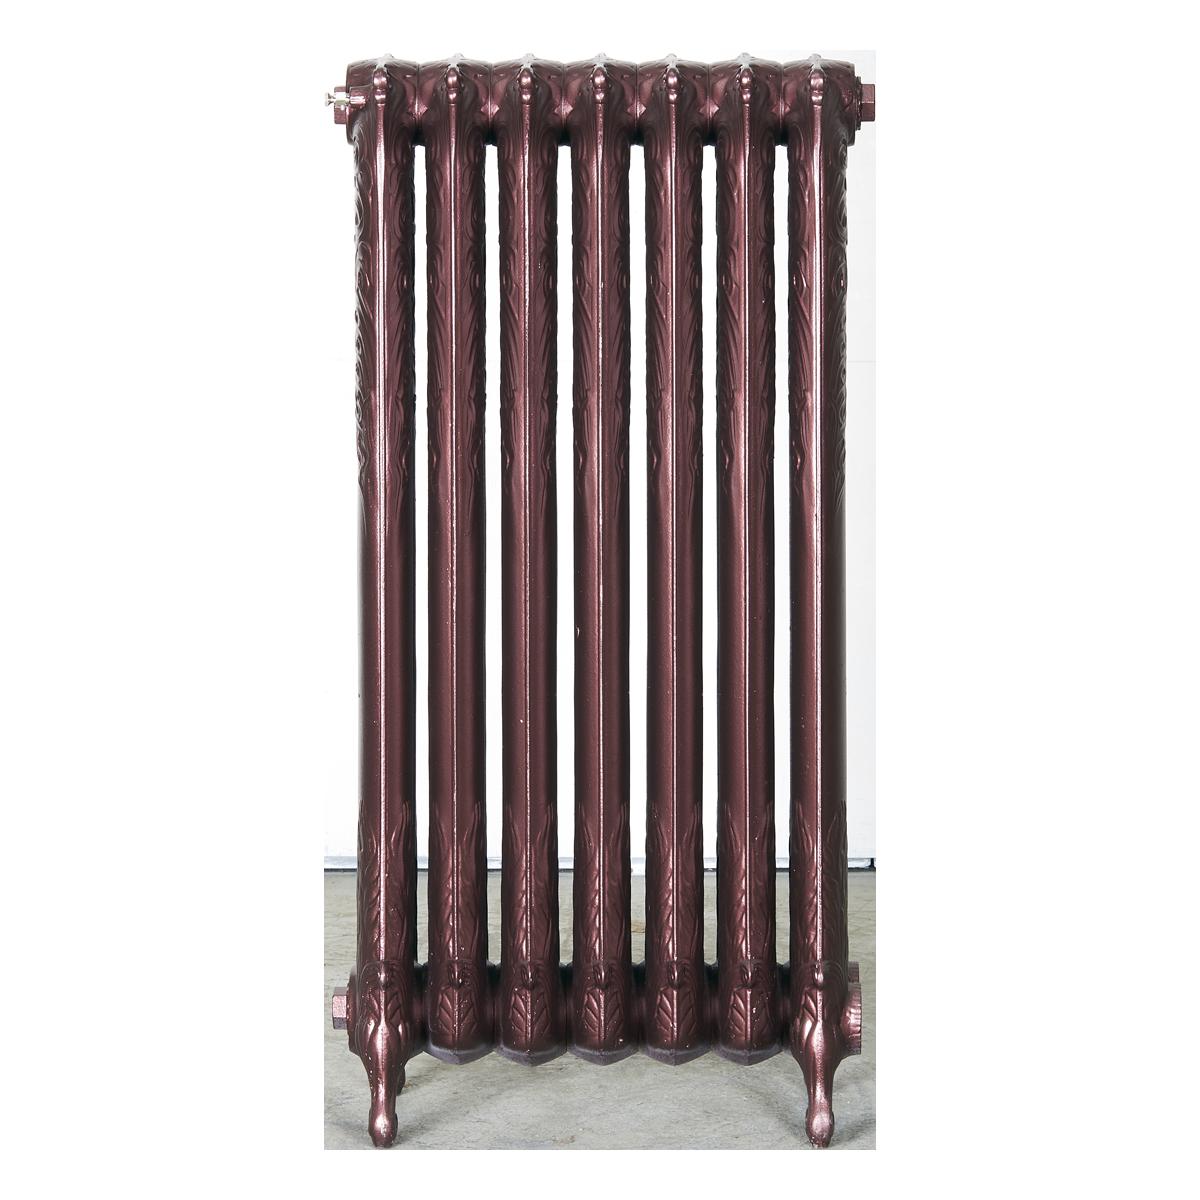 Ironworks Radiators Inc. refurbished cast iron radiator Chapeltown in Black Cherry metallic